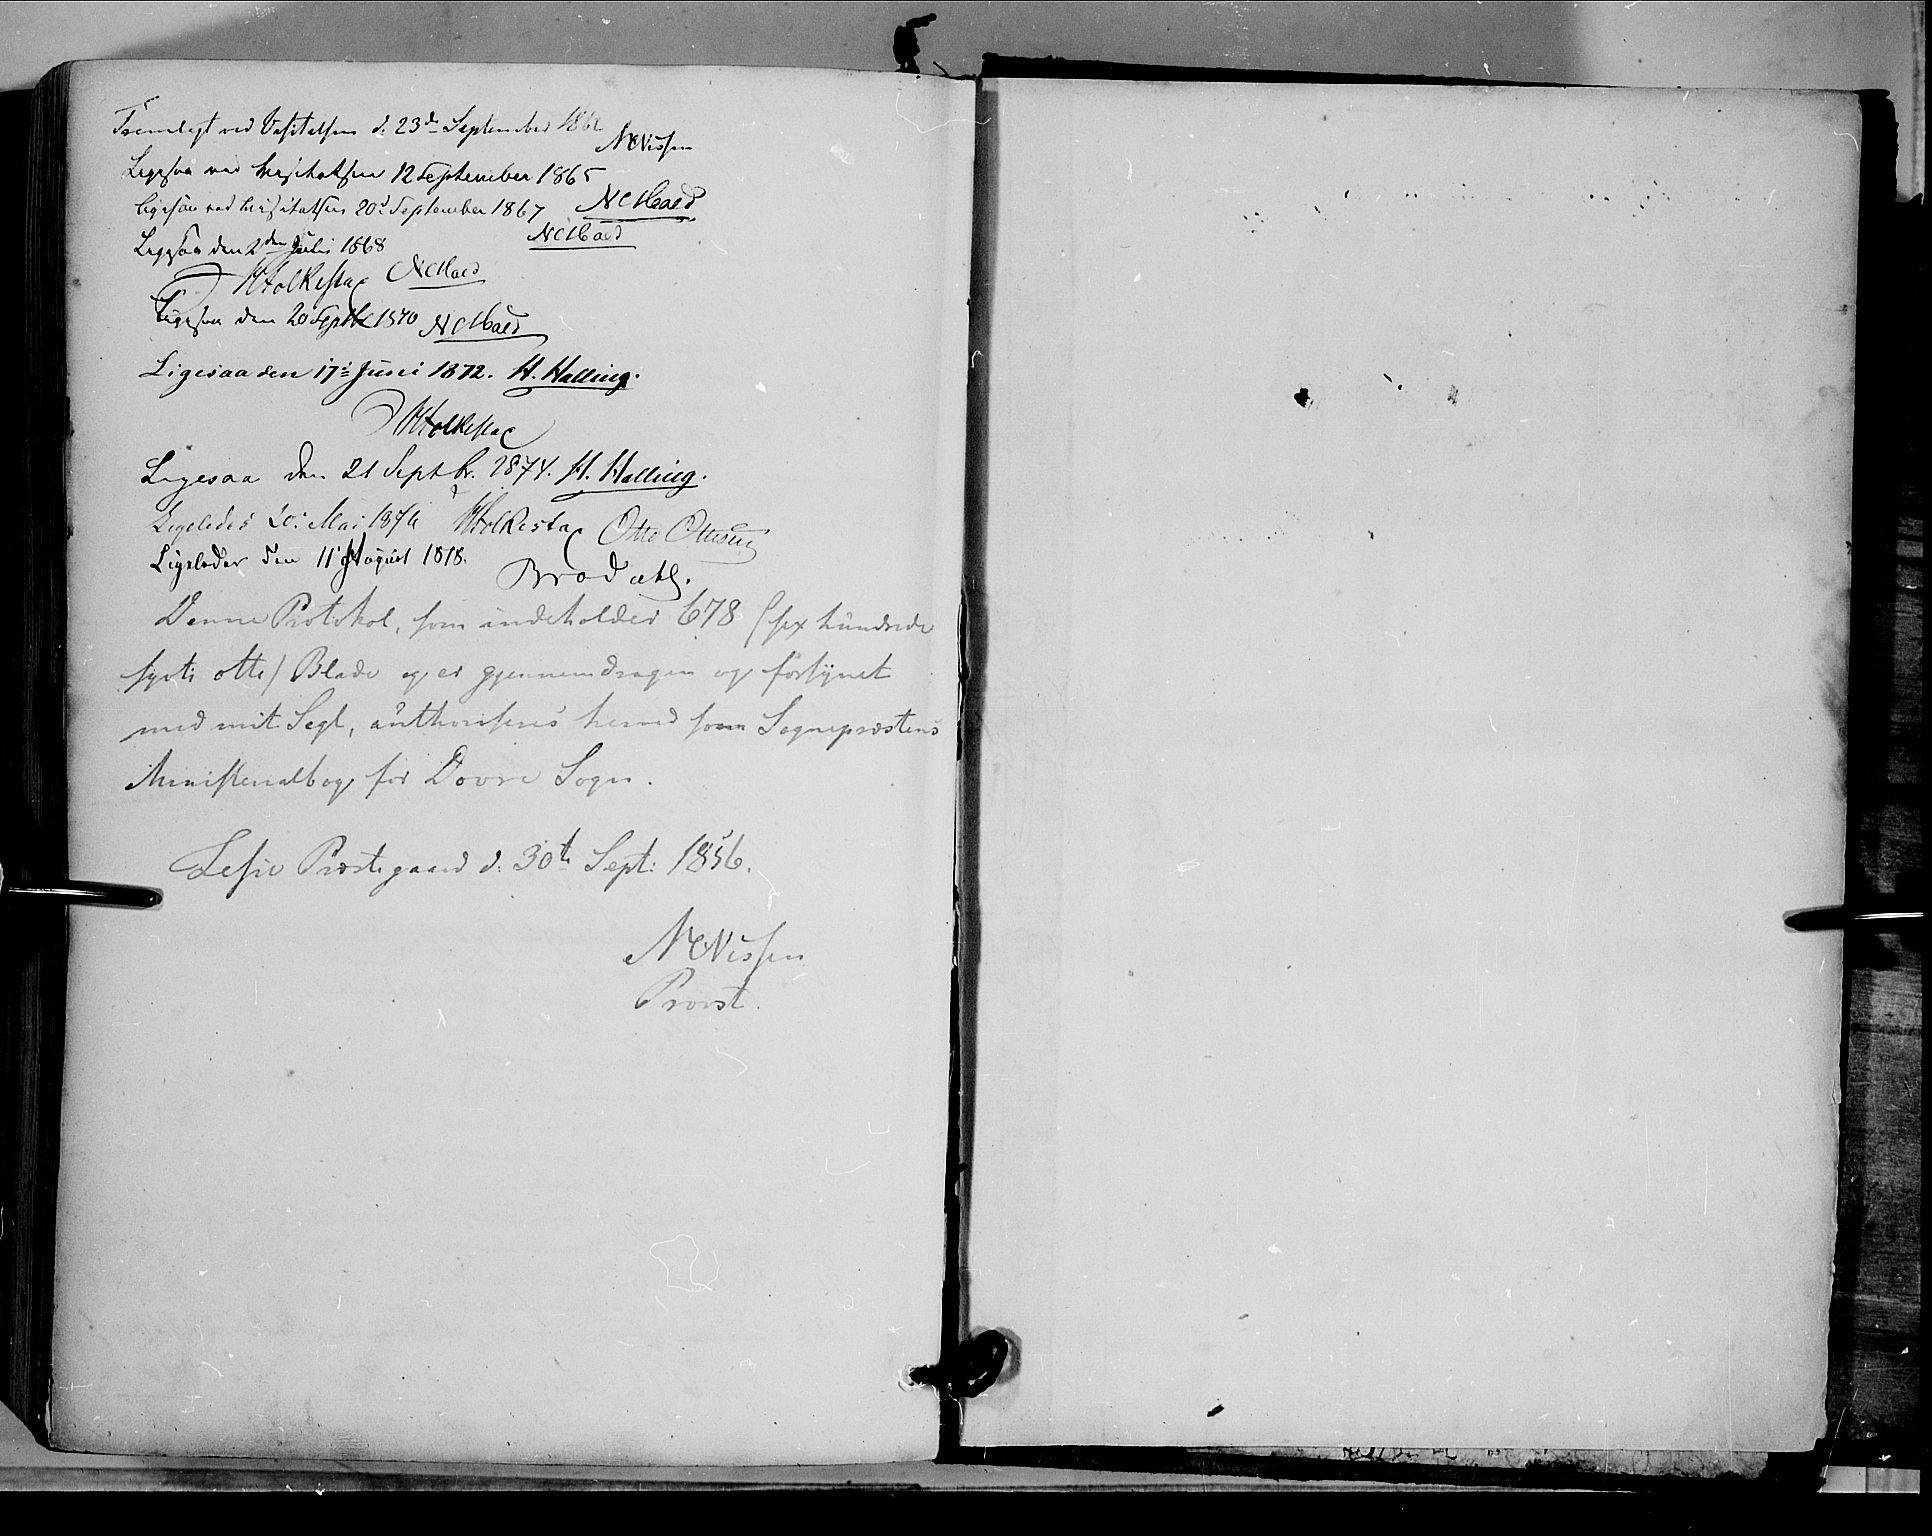 SAH, Dovre prestekontor, Ministerialbok nr. 1, 1854-1878